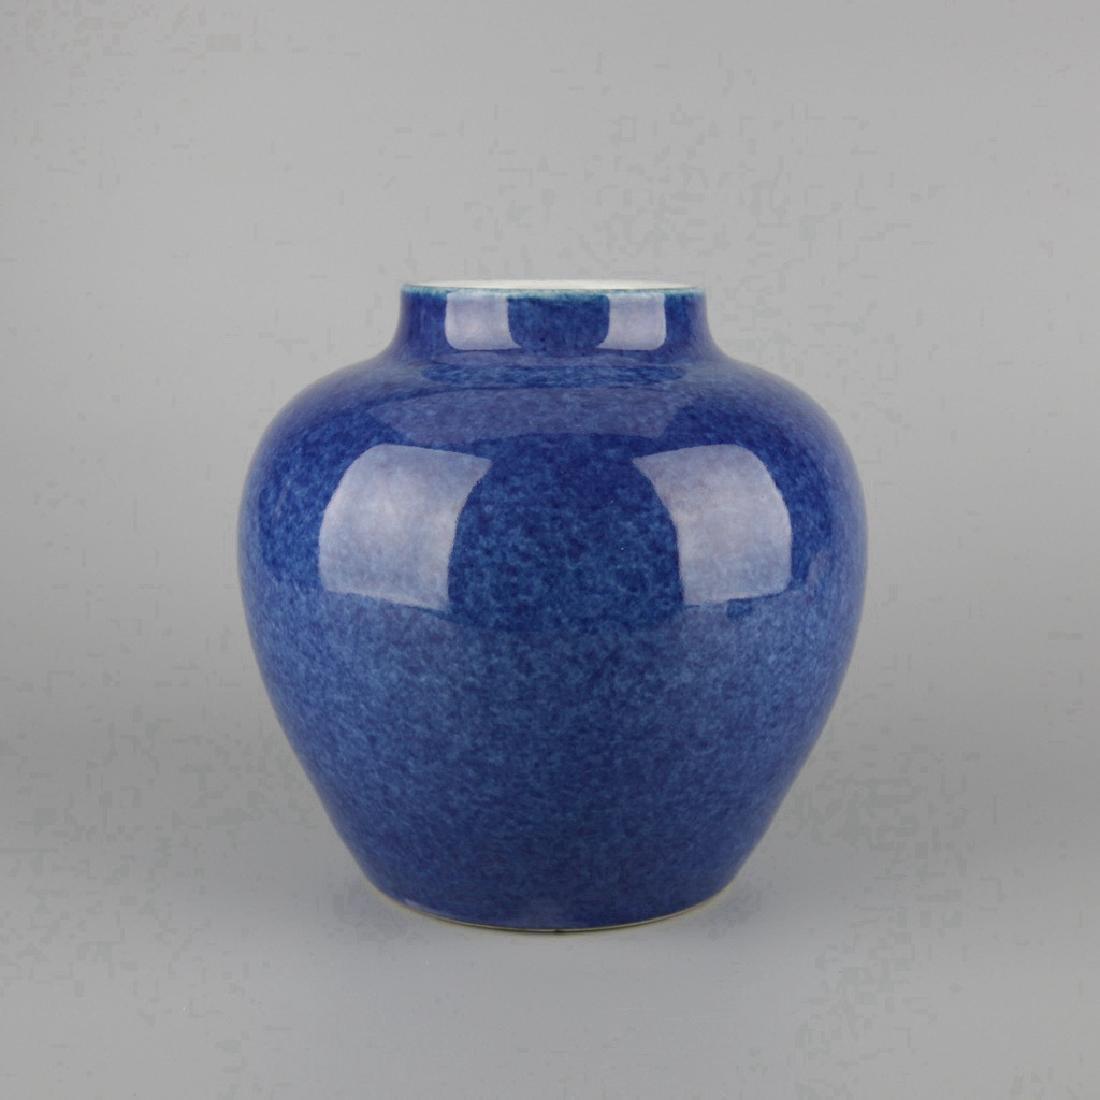 Chinese Porcelain Mottled Blue Vase